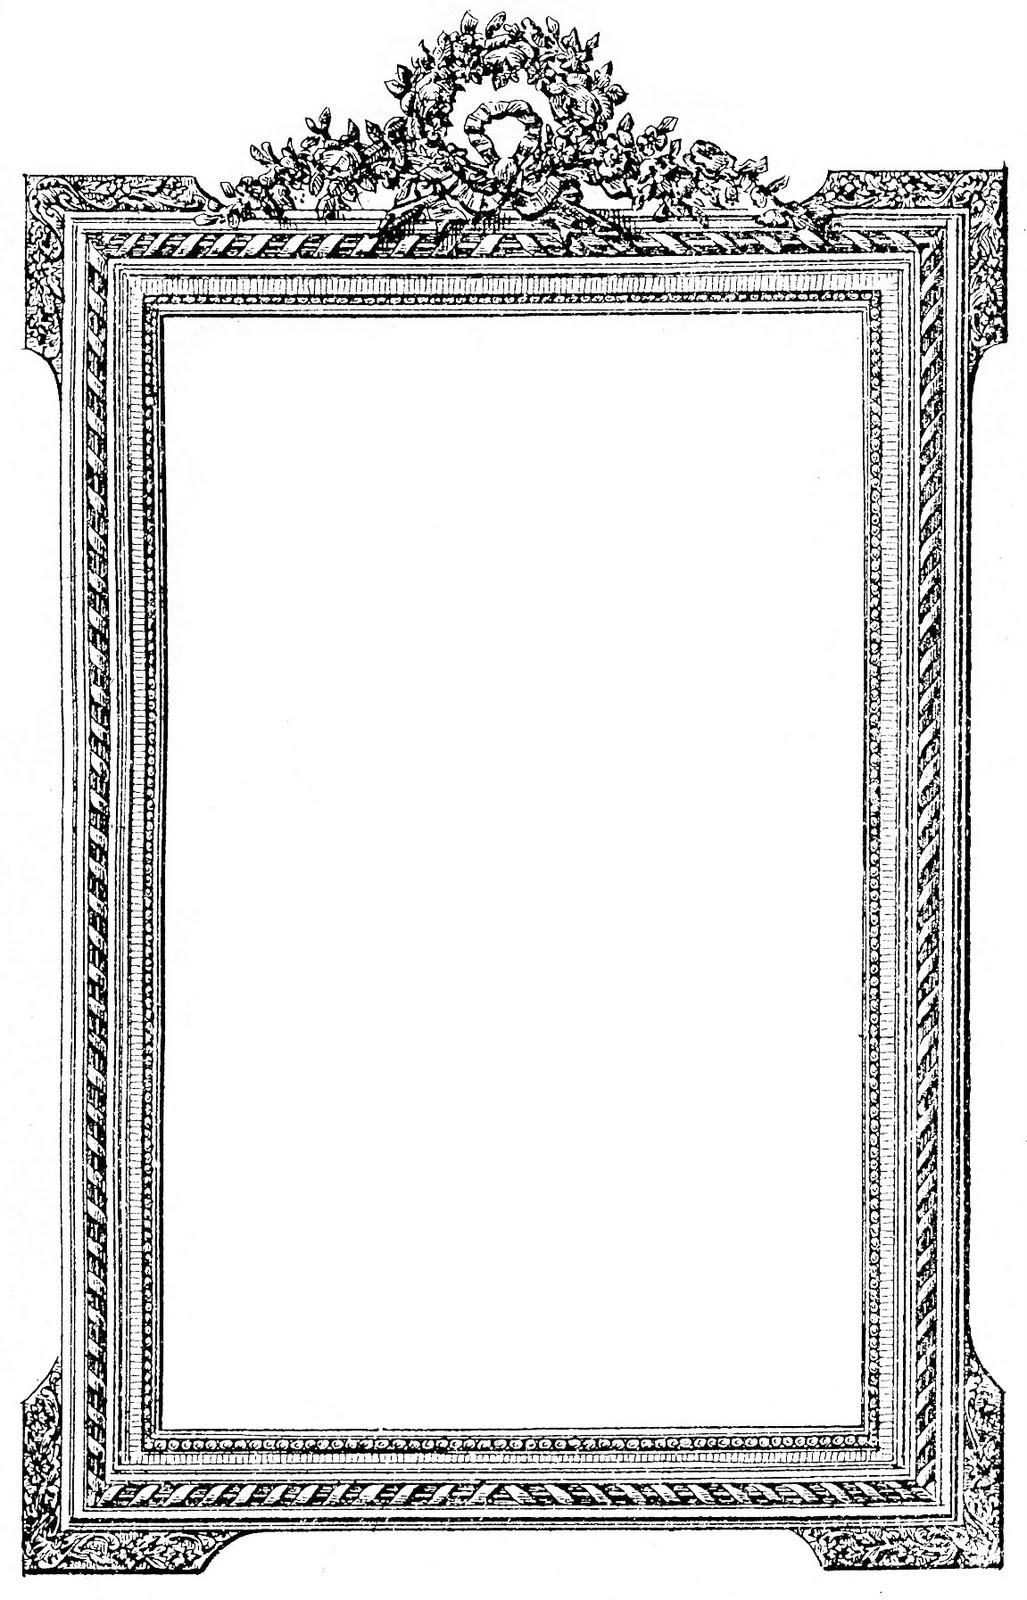 antique frame clip art graphics fairy-antique frame clip art graphics fairy-12